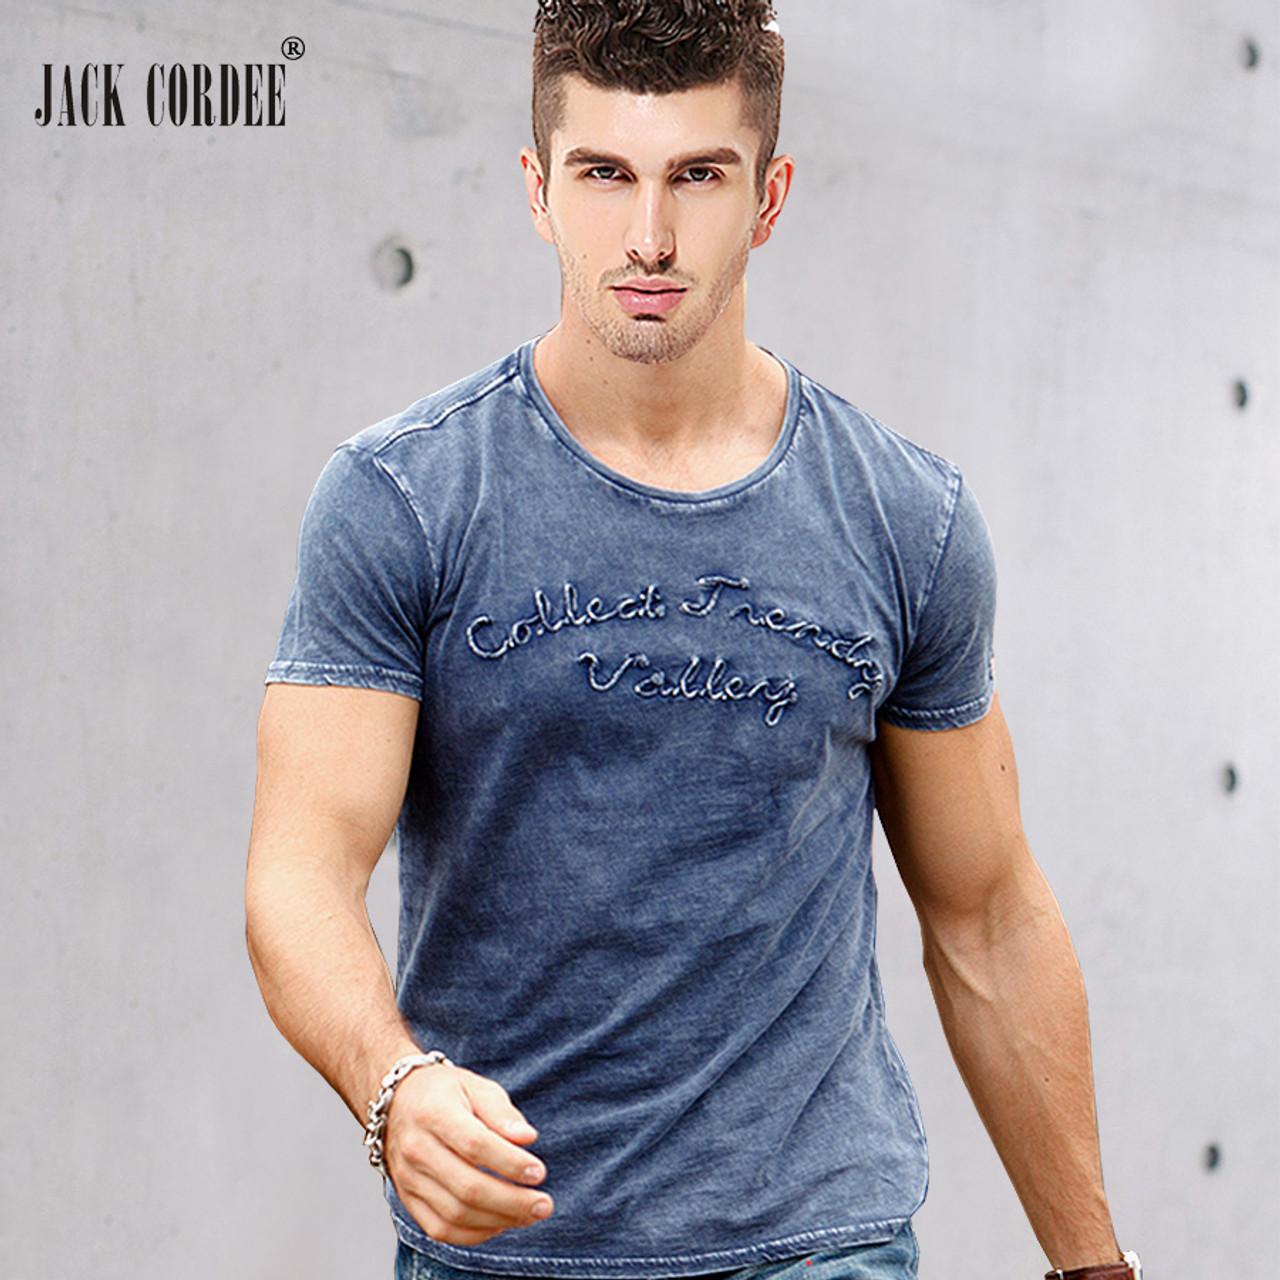 5ab669c70f03 JACK CORDEE Fashion T shirt Men Letter Embroidered 100% Cotton Tee Shirt  Slim Short Sleeve ...